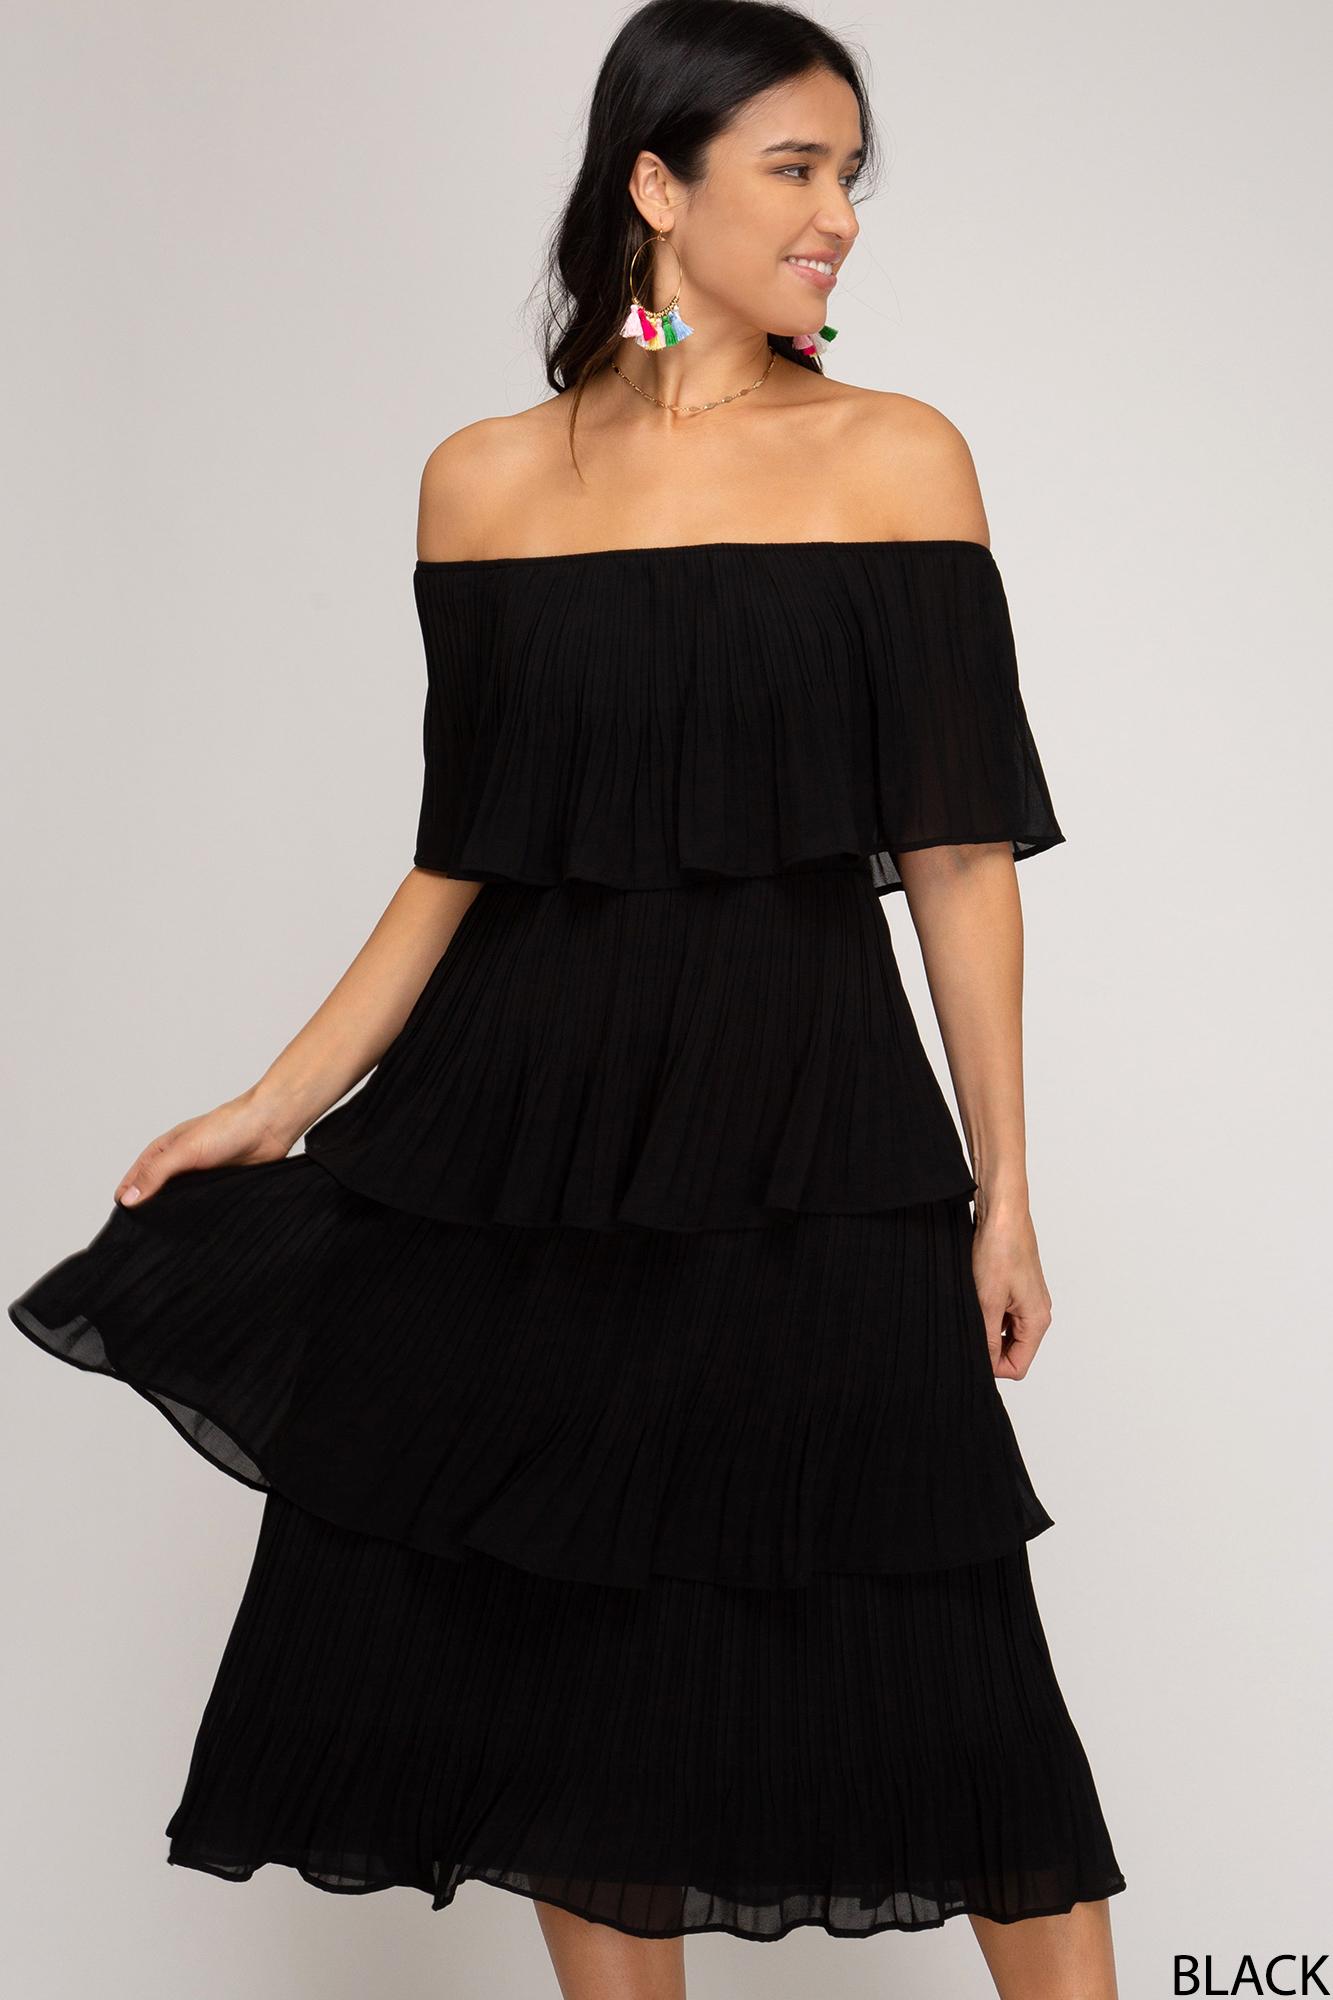 Layered Midi Dress from She & Sky